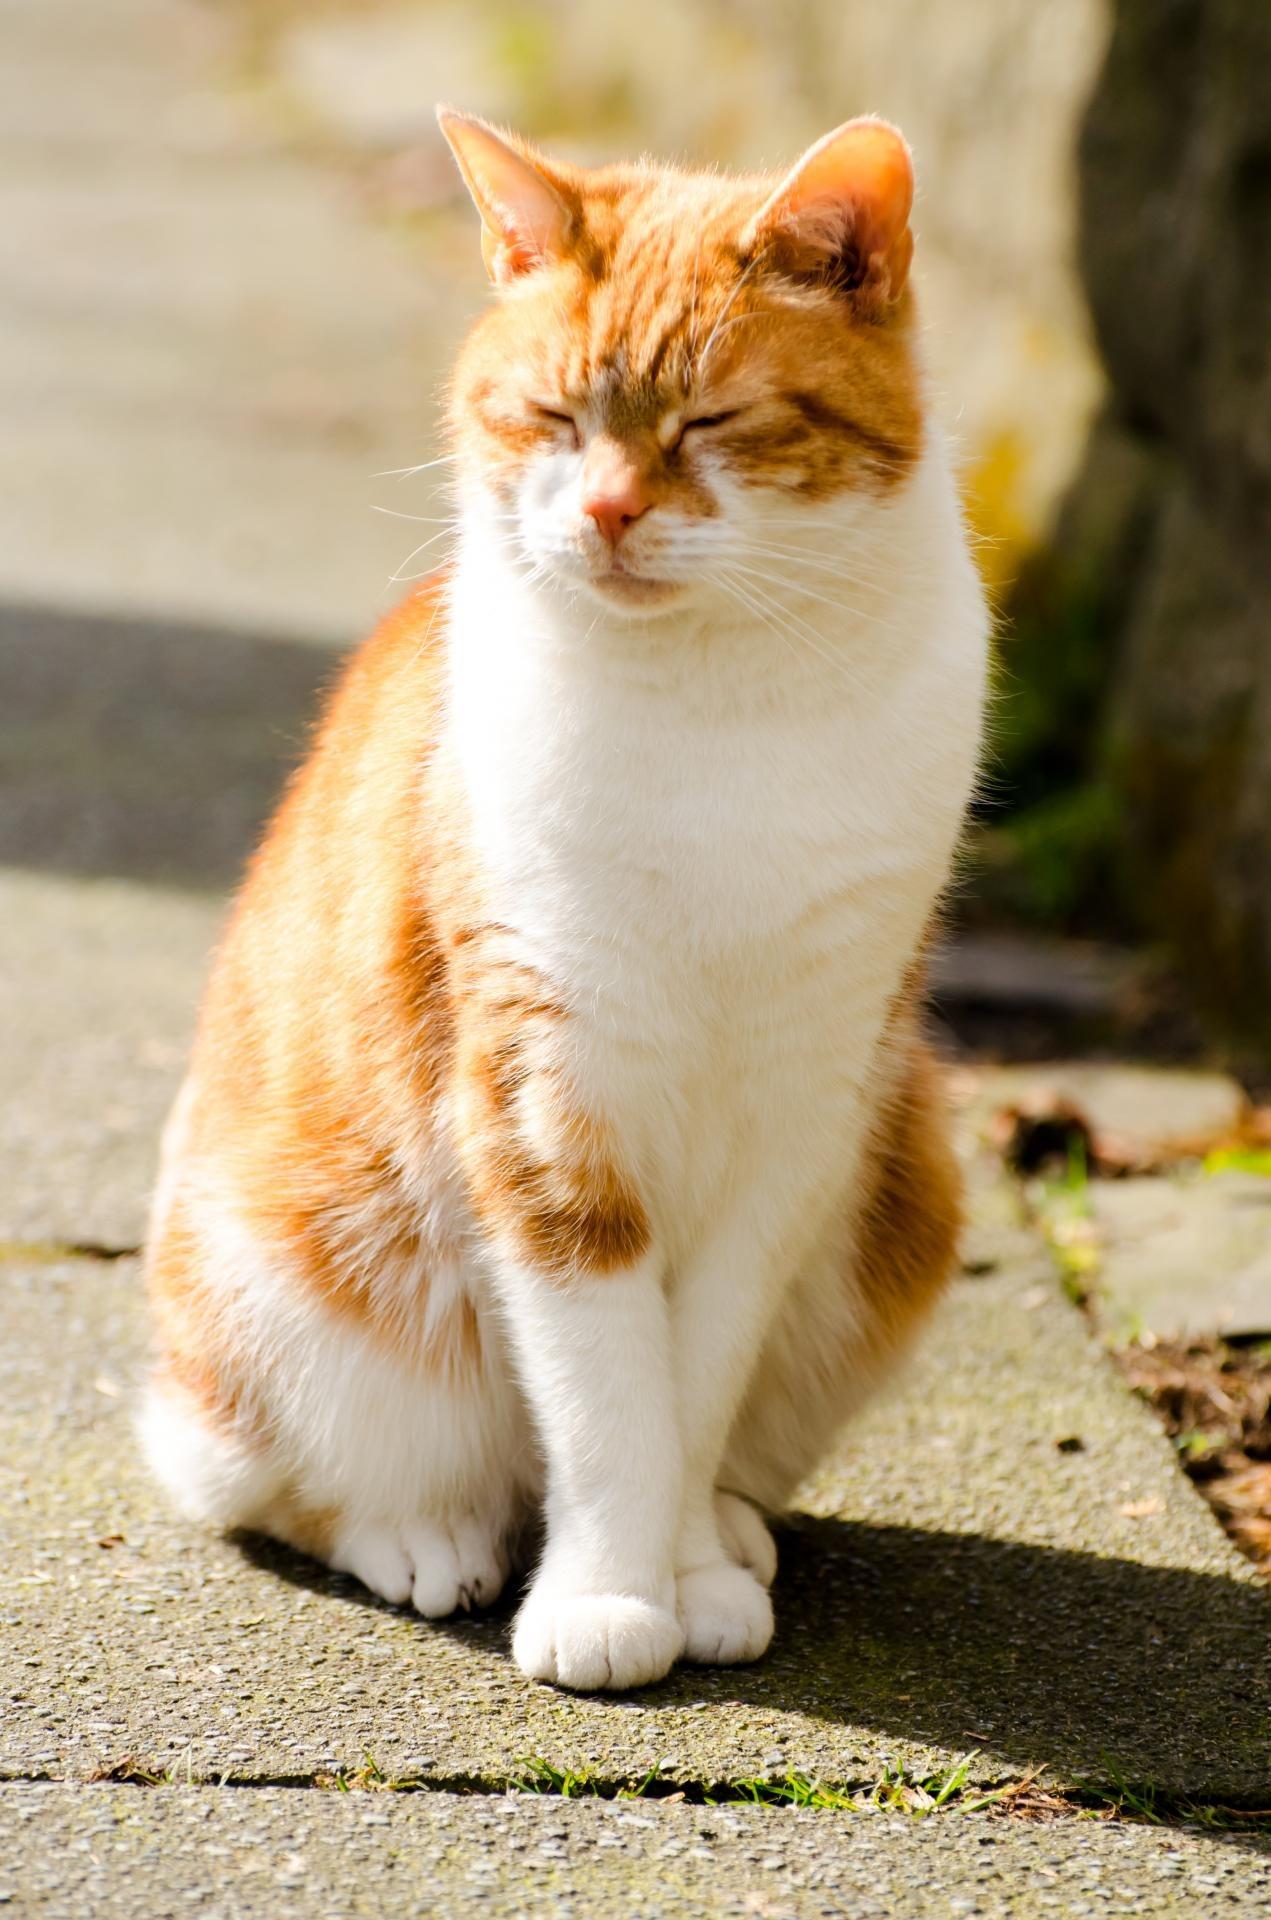 Download 108 Background Kucing Orange HD Gratis